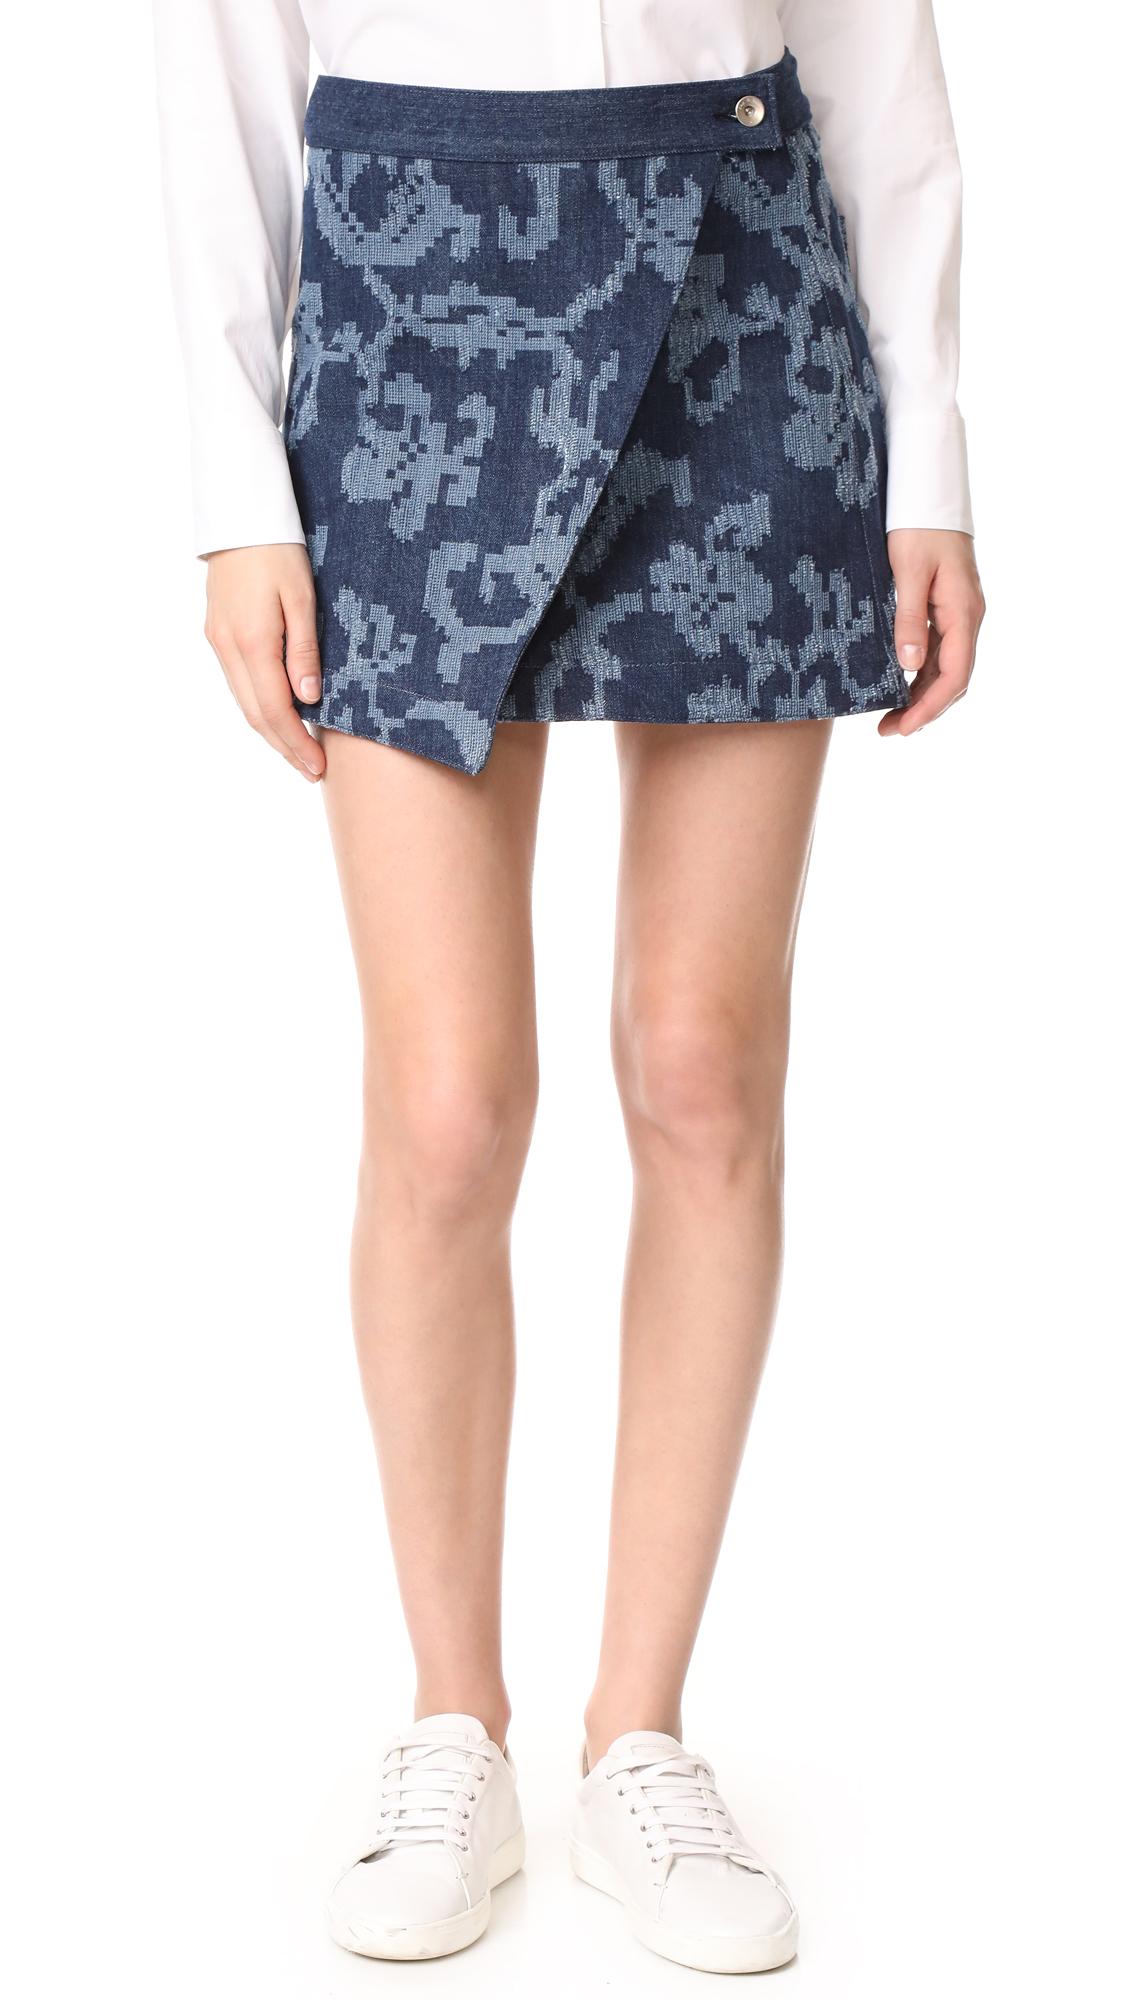 Rag & Bone Marina Jean Skirt - Indigo